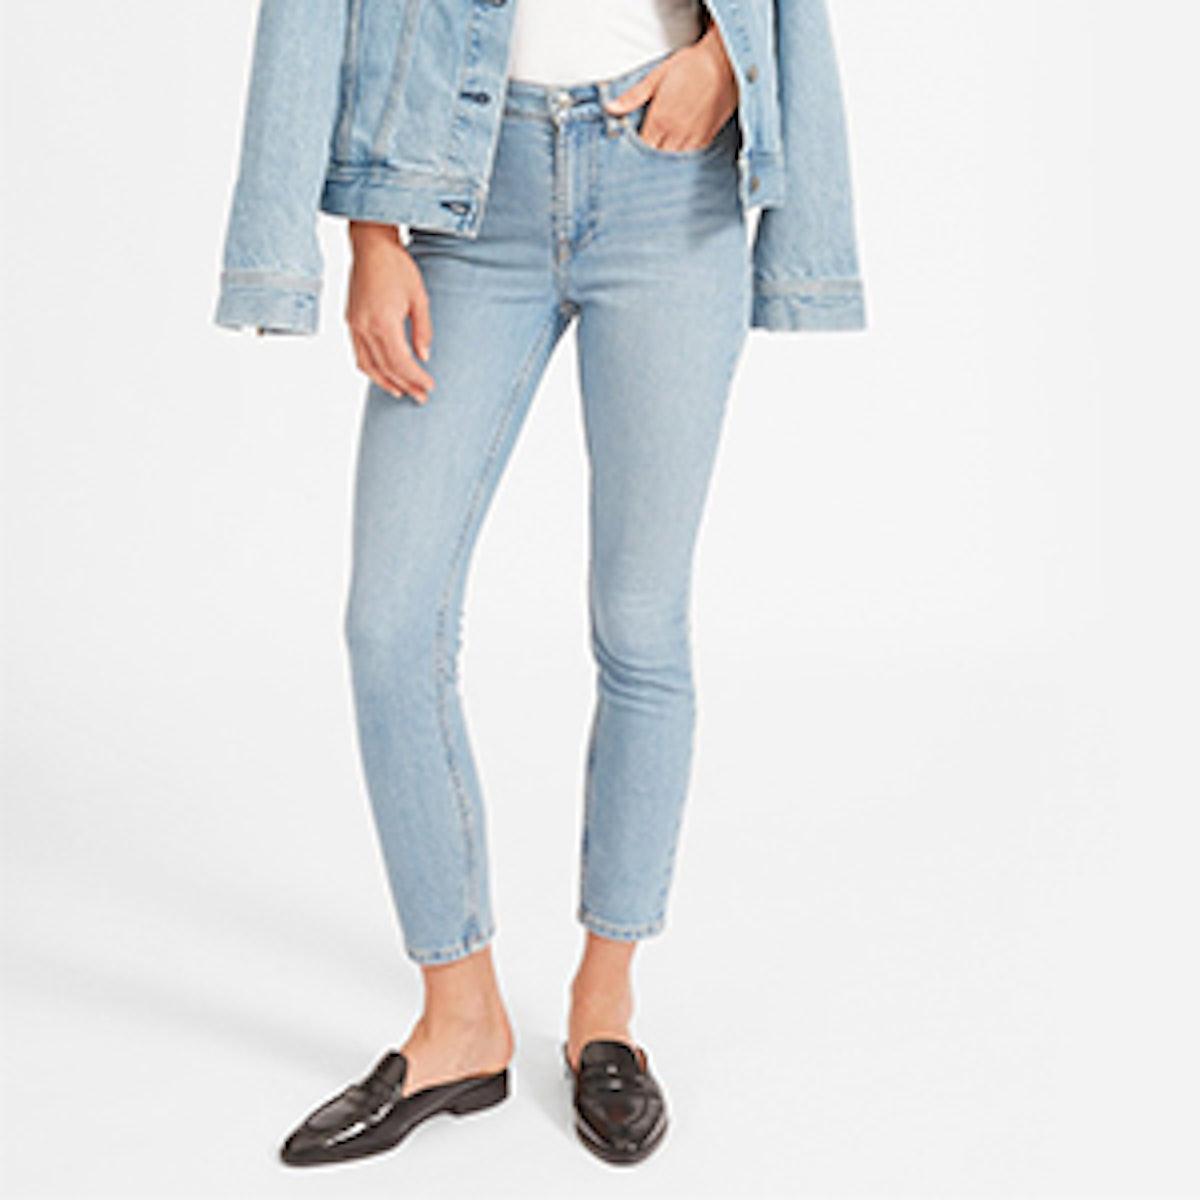 The High-Rise Skinny Jean